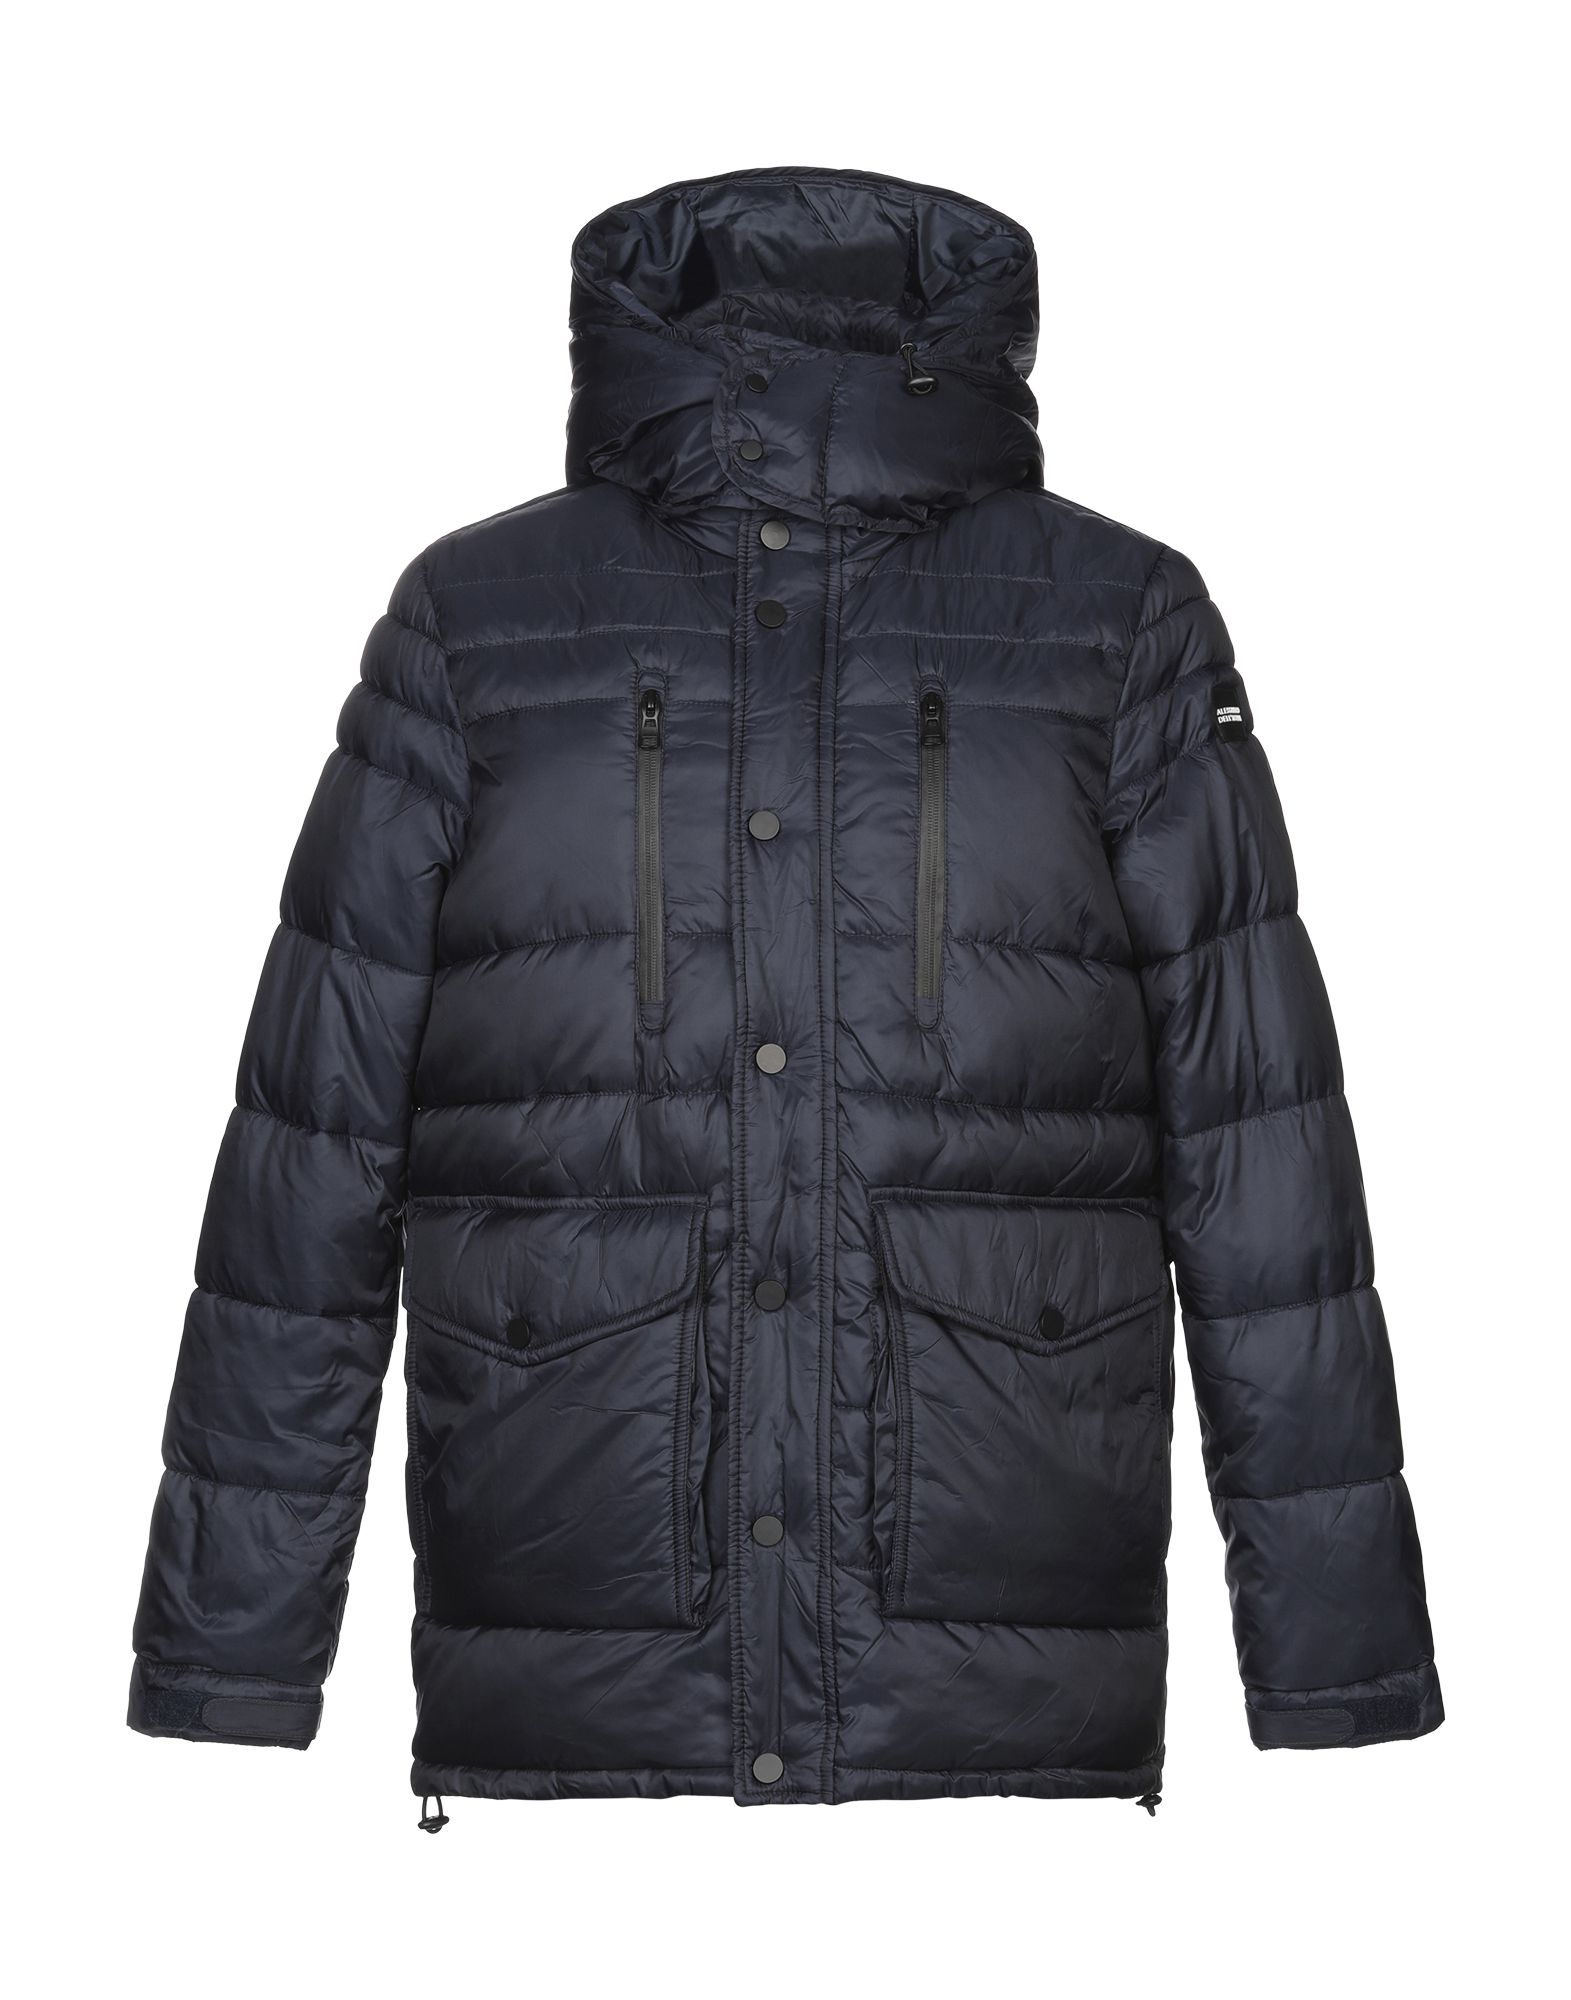 ALESSANDRO DELL'ACQUA Synthetic Down Jackets - Item 41927691